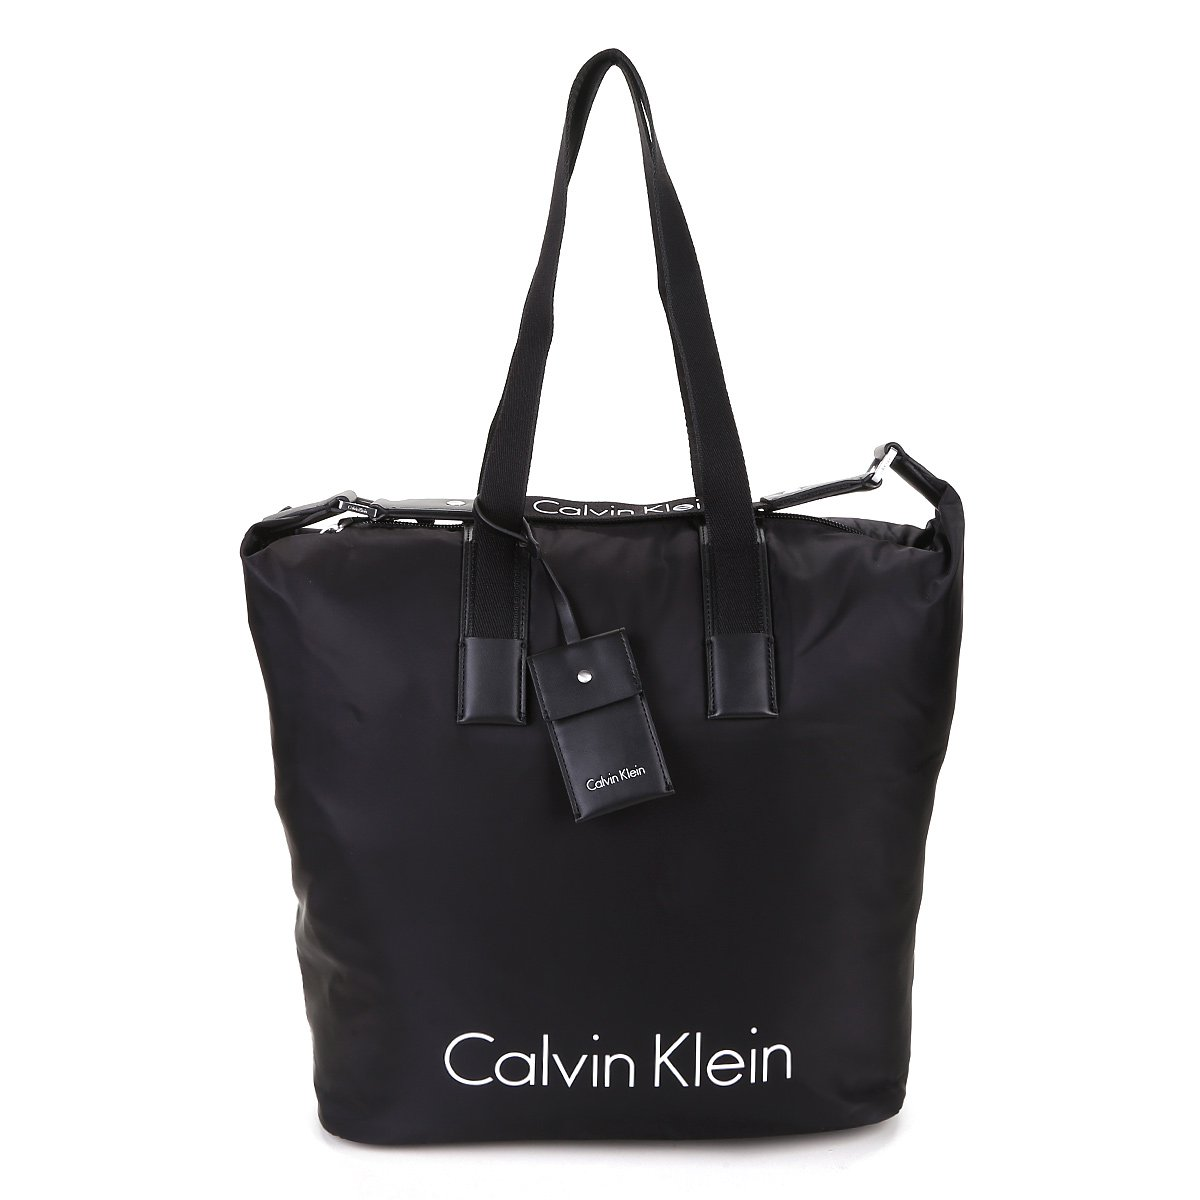 1103a2b909f27 Bolsa Calvin Klein Shopper Grande Nylon Feminina - Preto - Compre ...